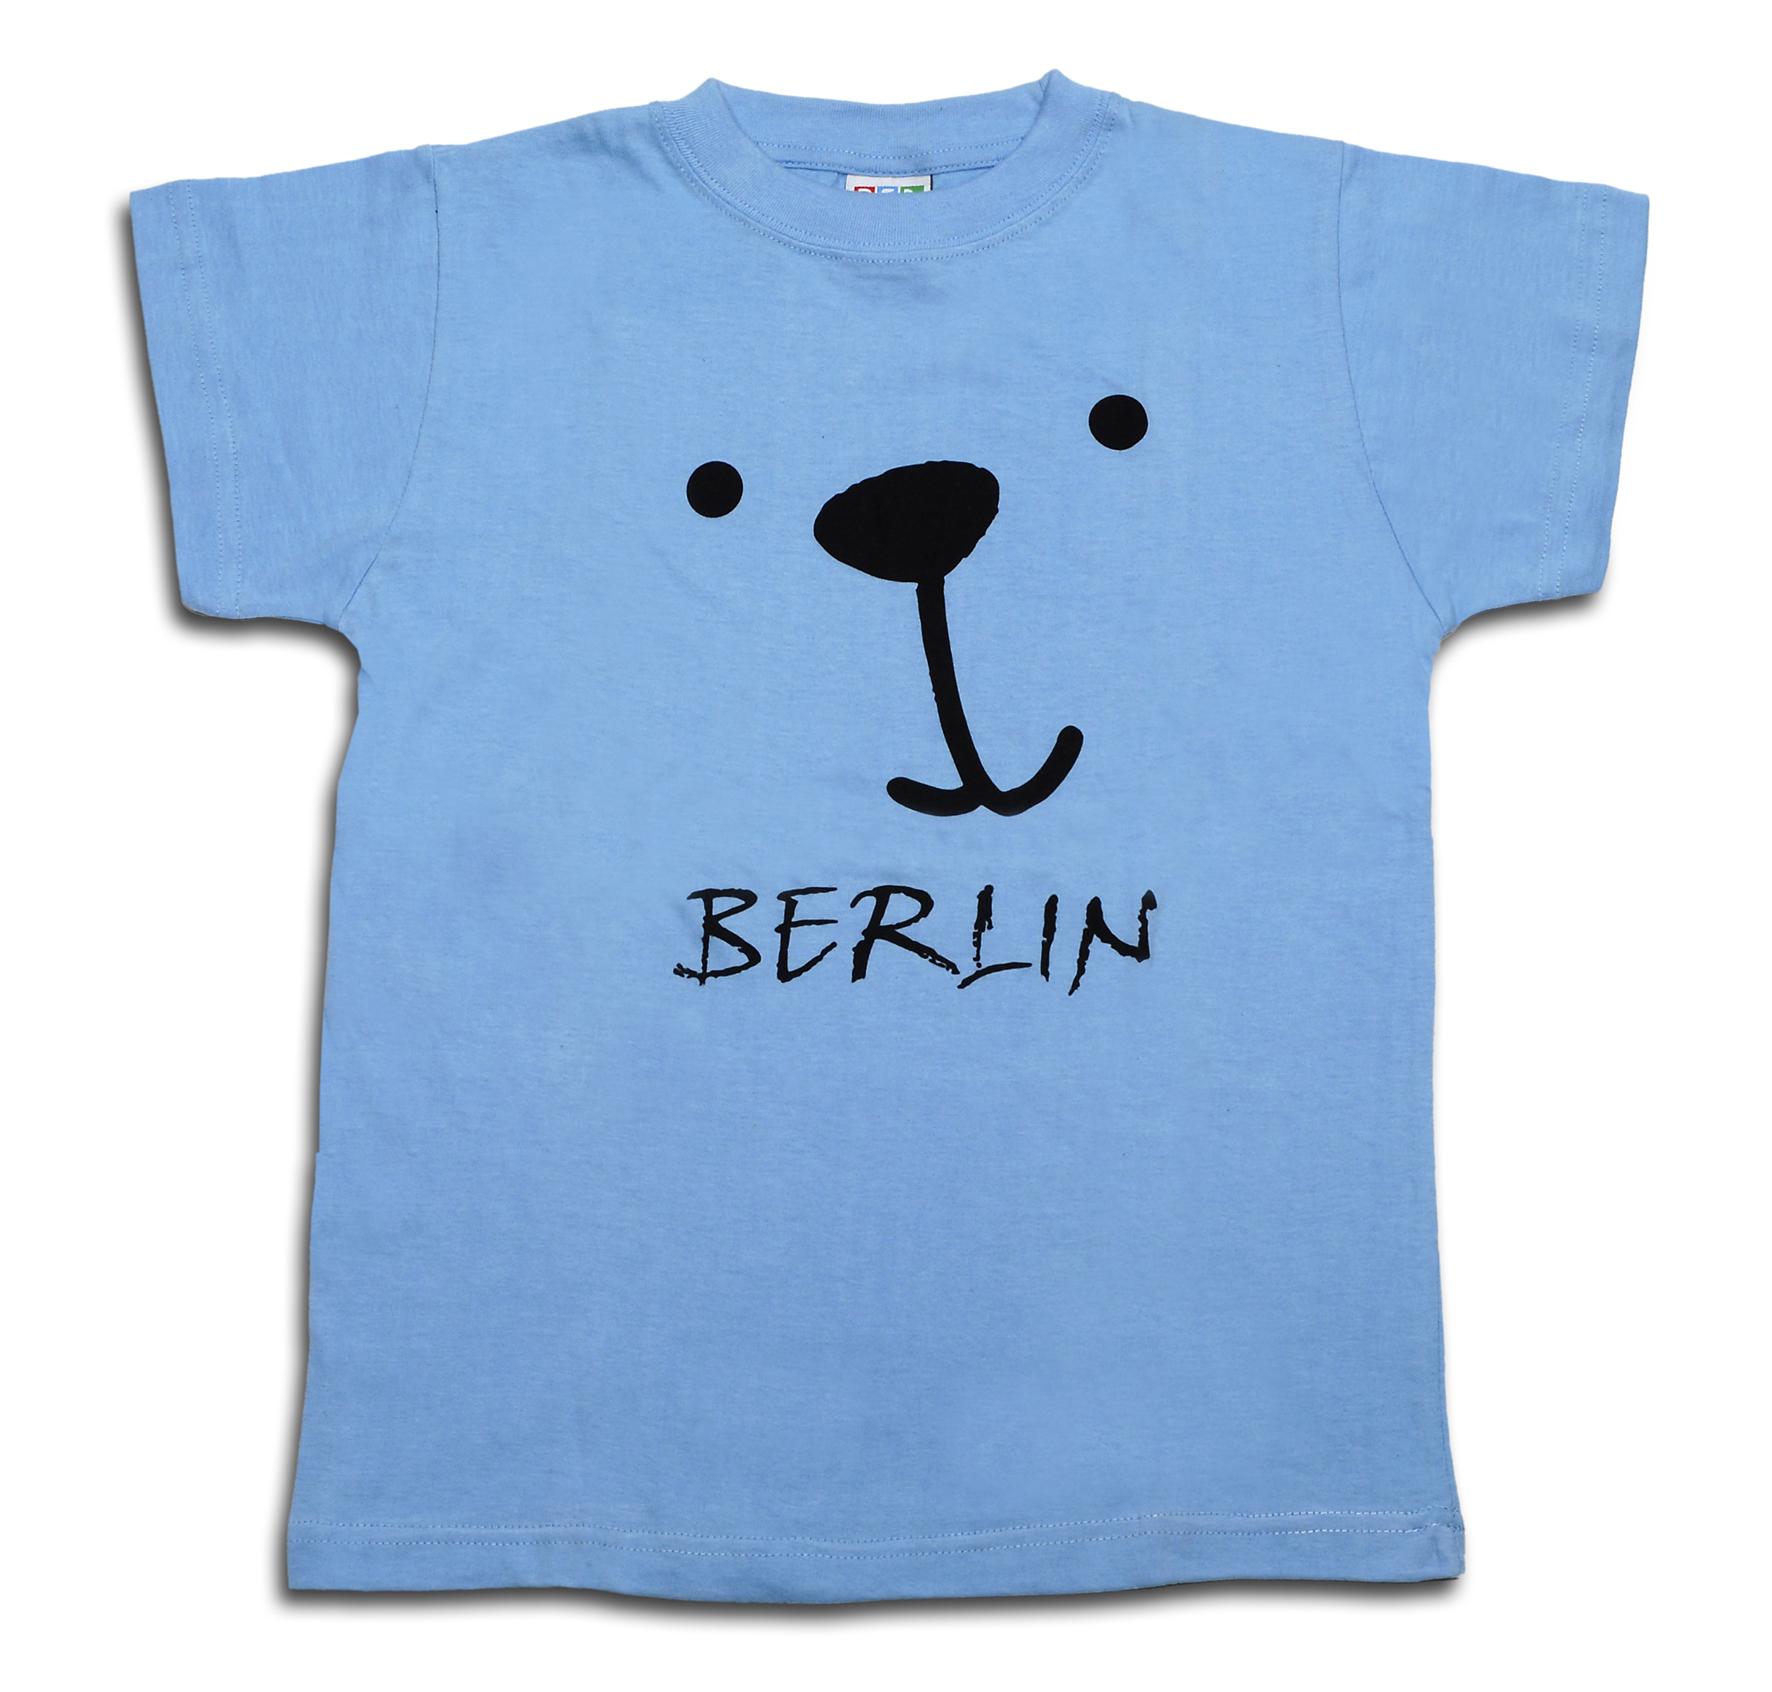 010-6221_Kids_TS_Bärchen_blau